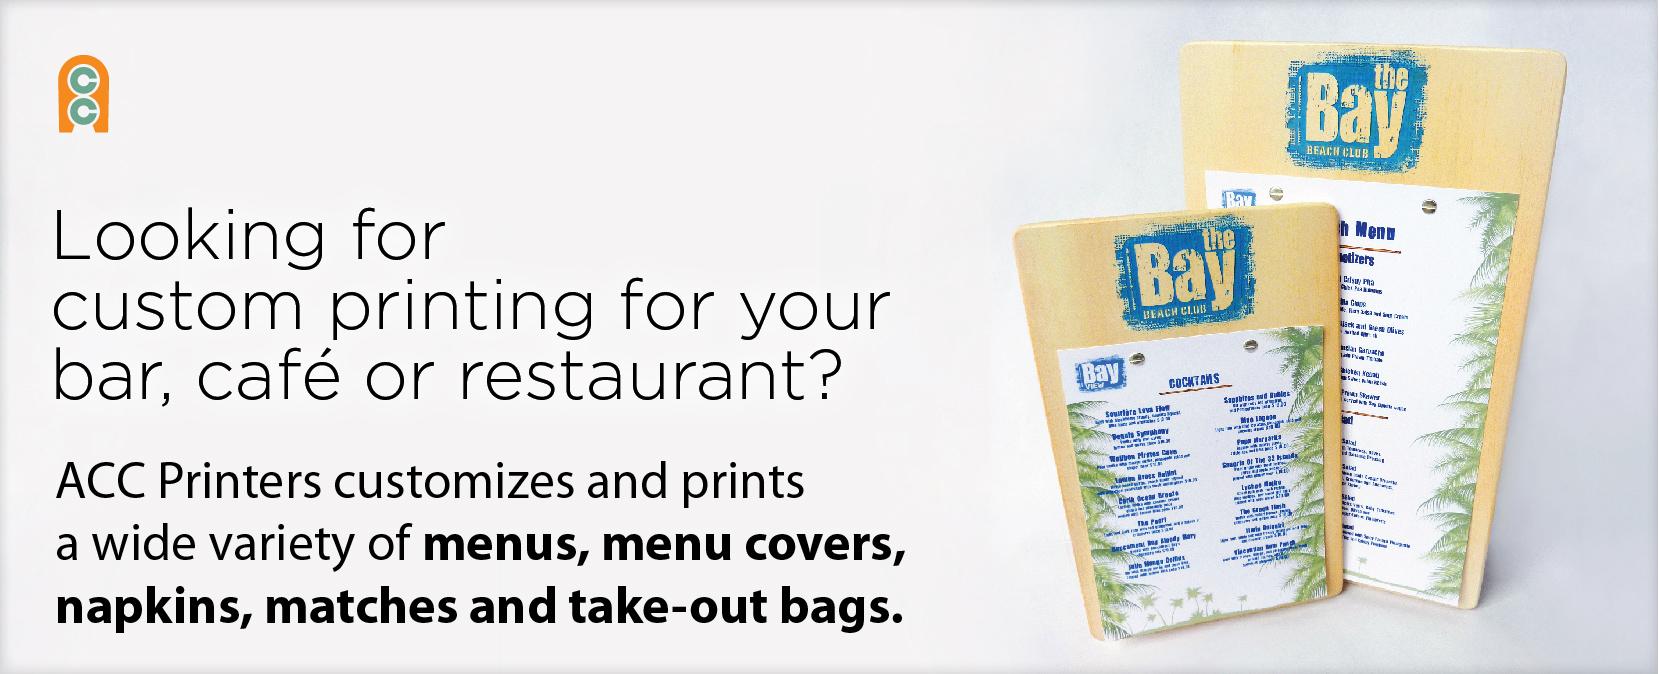 Printing for restaurants, bars, cafes. Get menus, menu covers, napkins, etc.